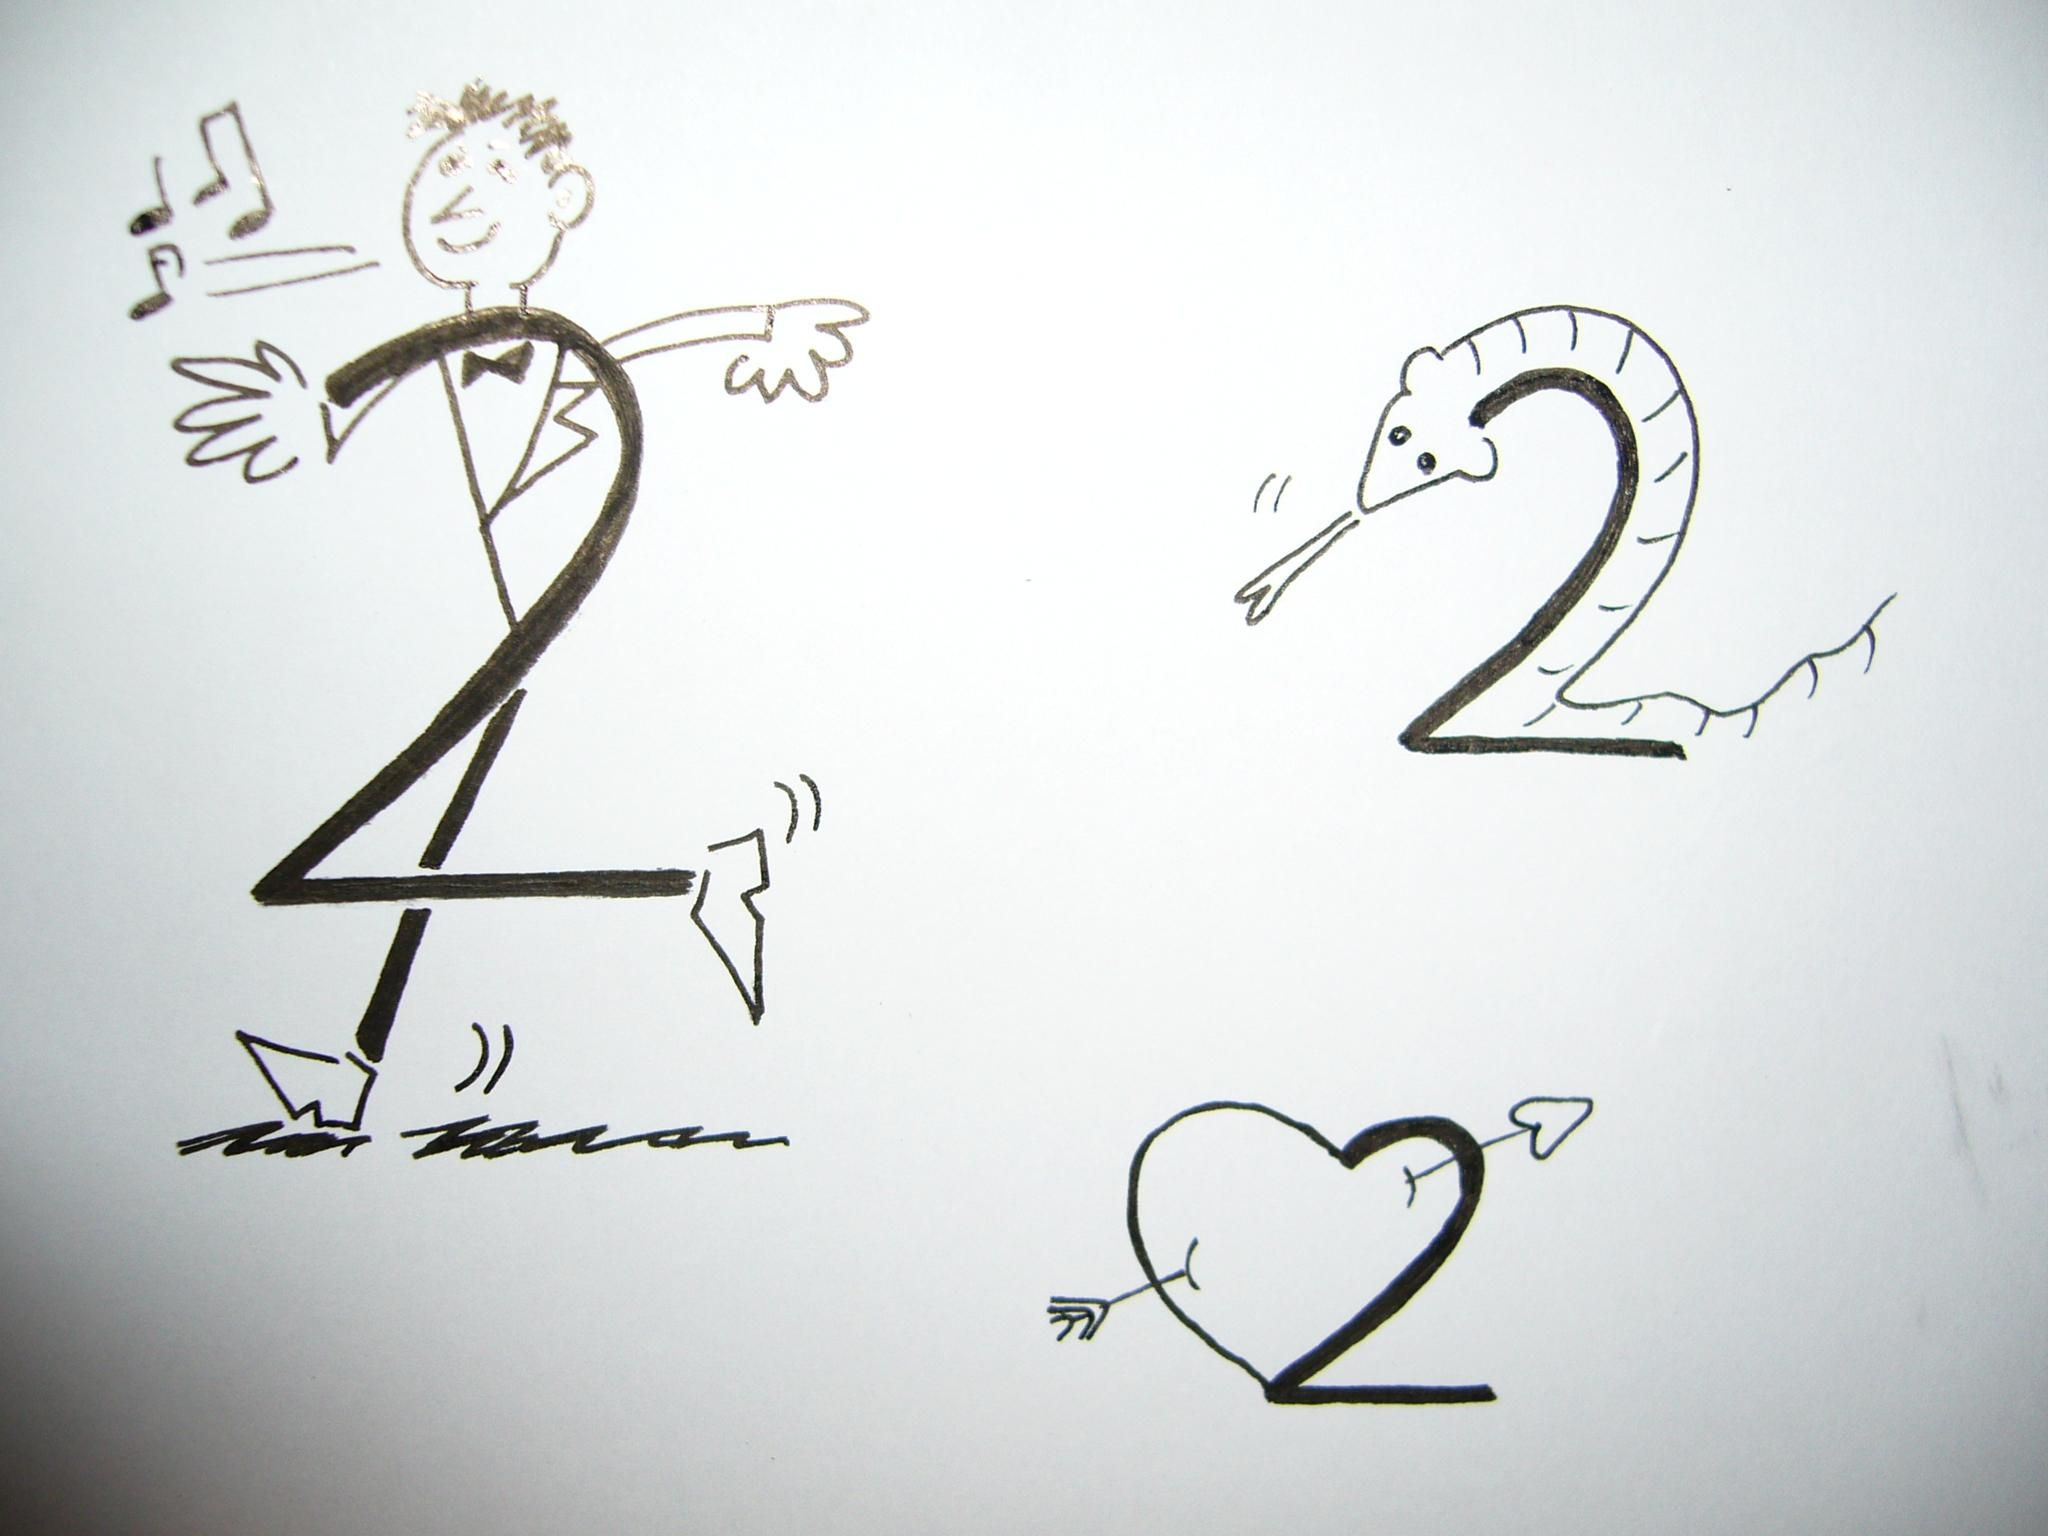 Como Dibujar El Numero 2 De Forma Original A Los Ninos Les Encanta Dibujar E Imaginar Aqui Te Ensenamos Un Ejer Como Dibujar Como Dibujar Con Numeros Dibujos